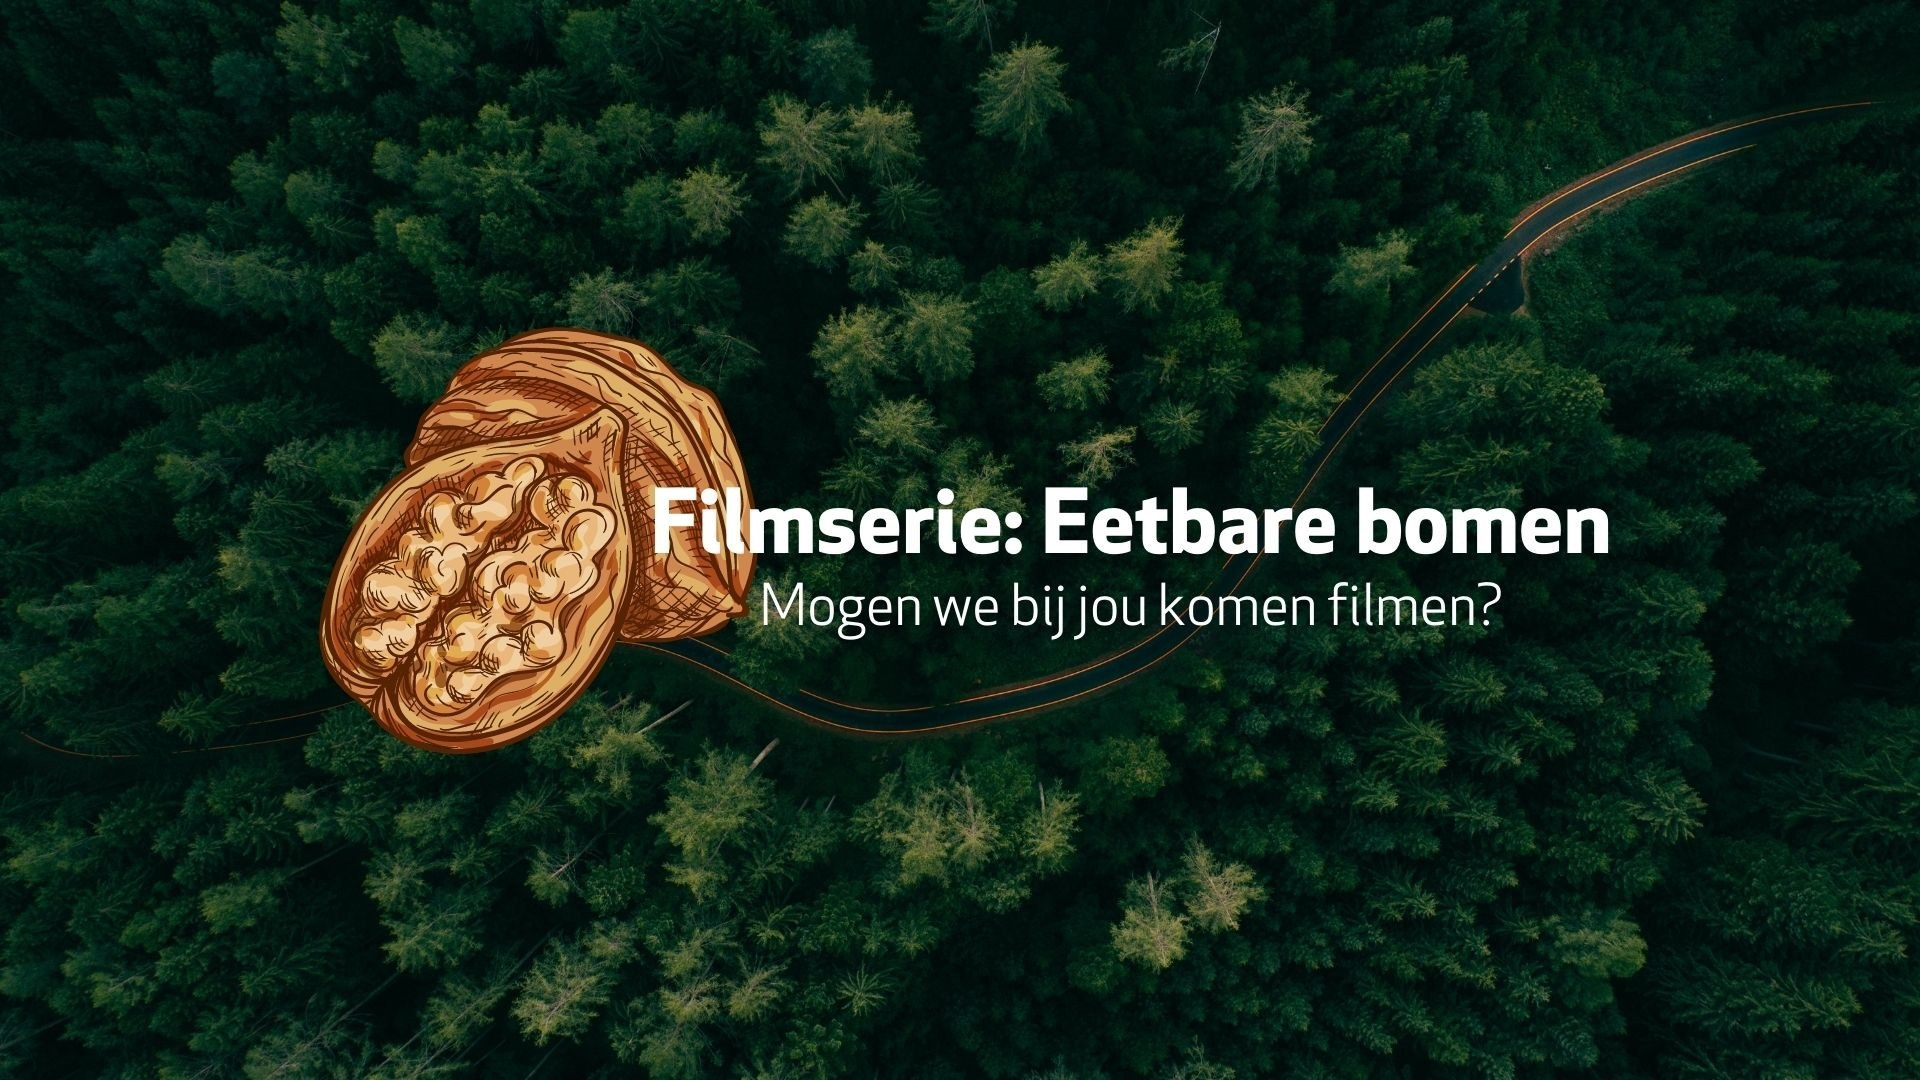 Filmserie: eetbare bomen